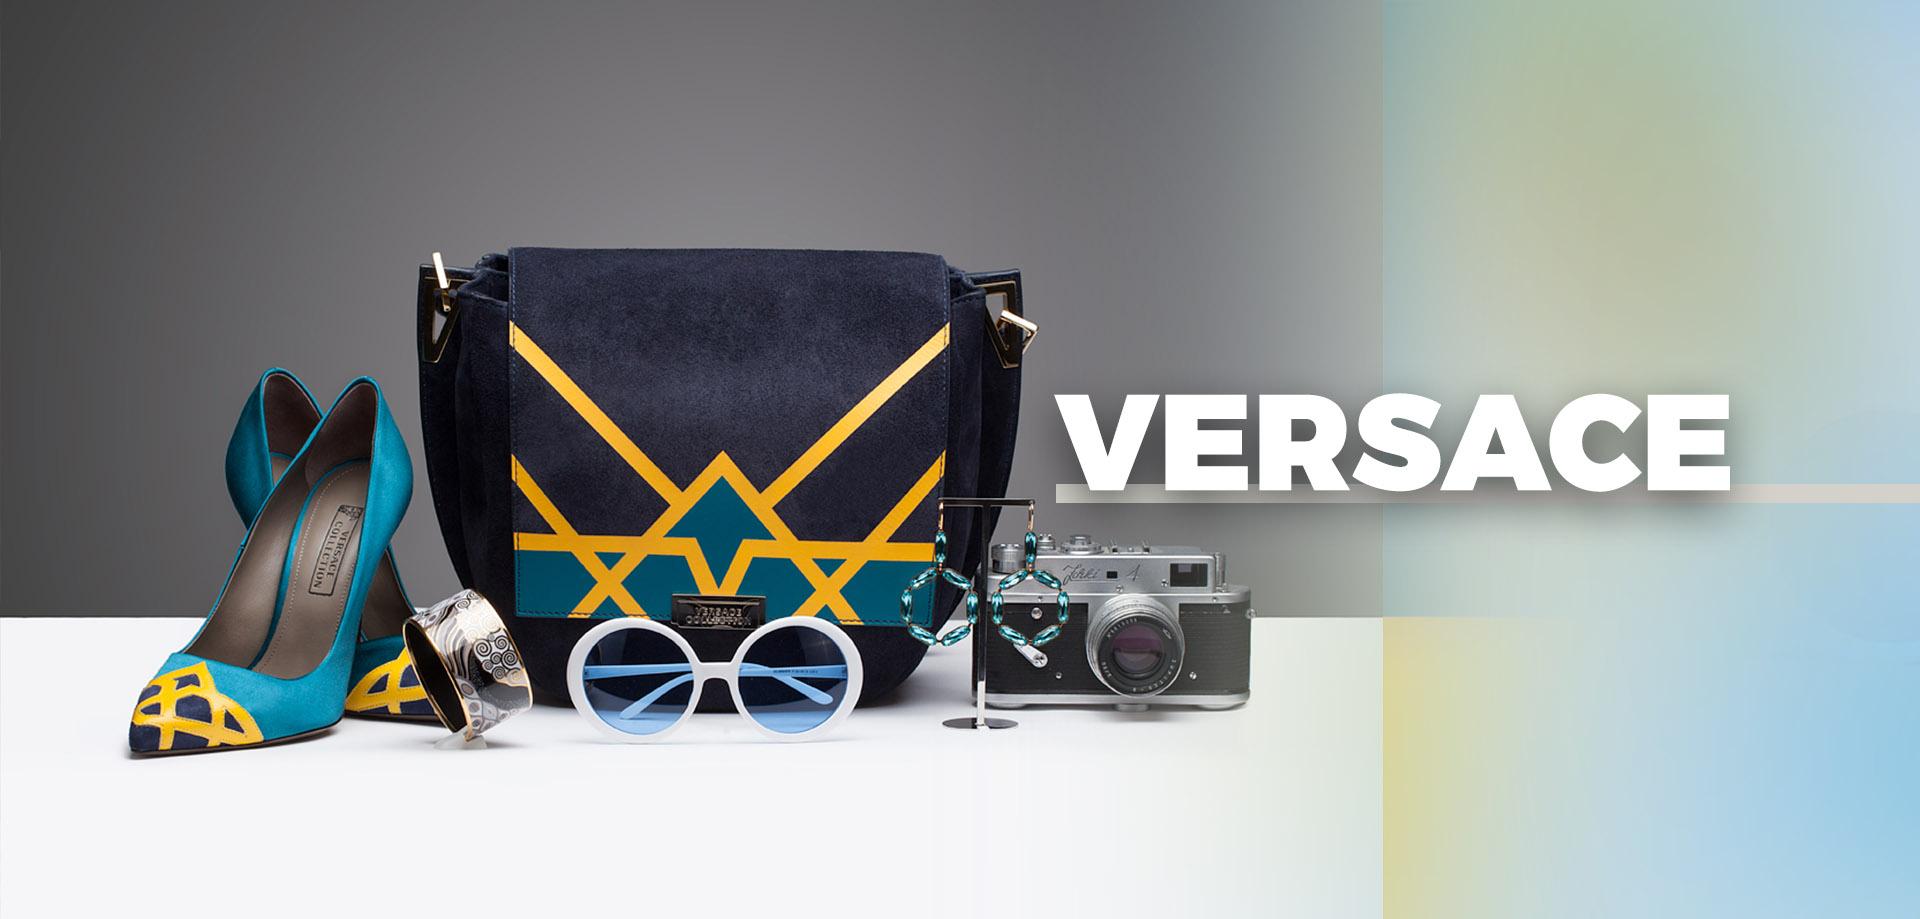 afterteam projects blog 03 versace 2018 banner01